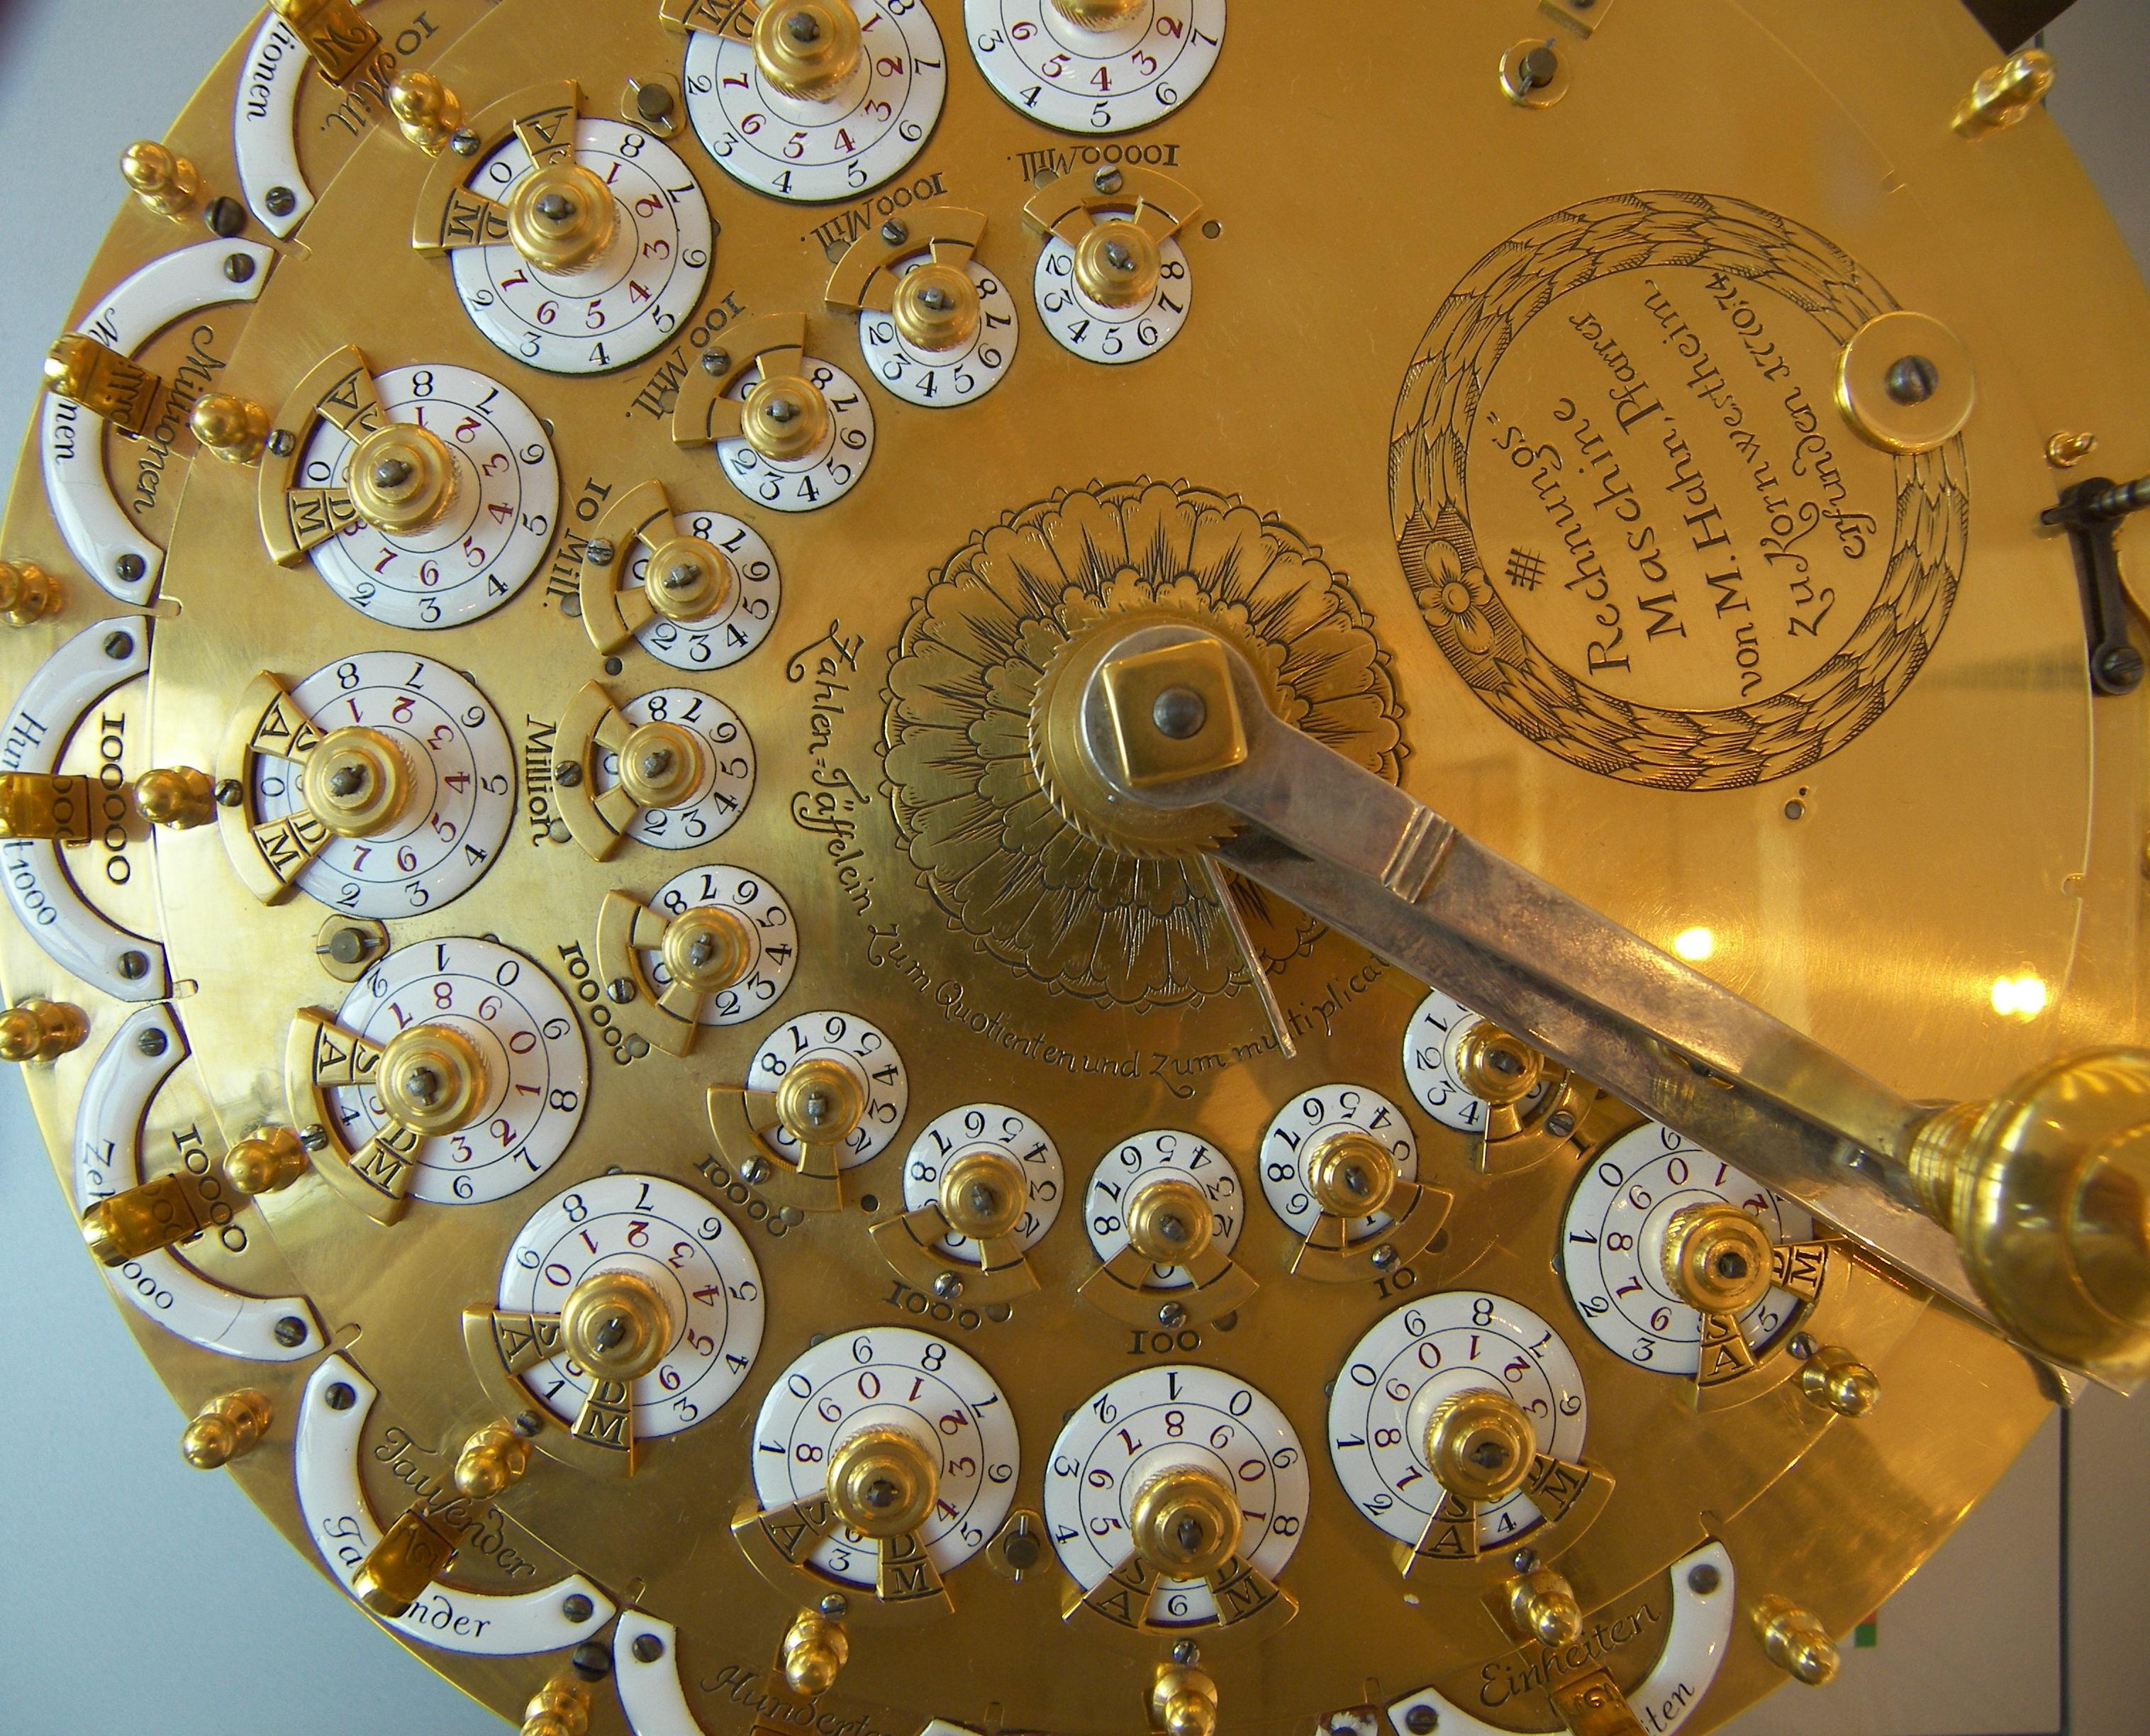 patroon museum machine verlichting cirkel kunst goud ontwerp duitsland snijwerk bonn rekenmachine oude geschiedenis